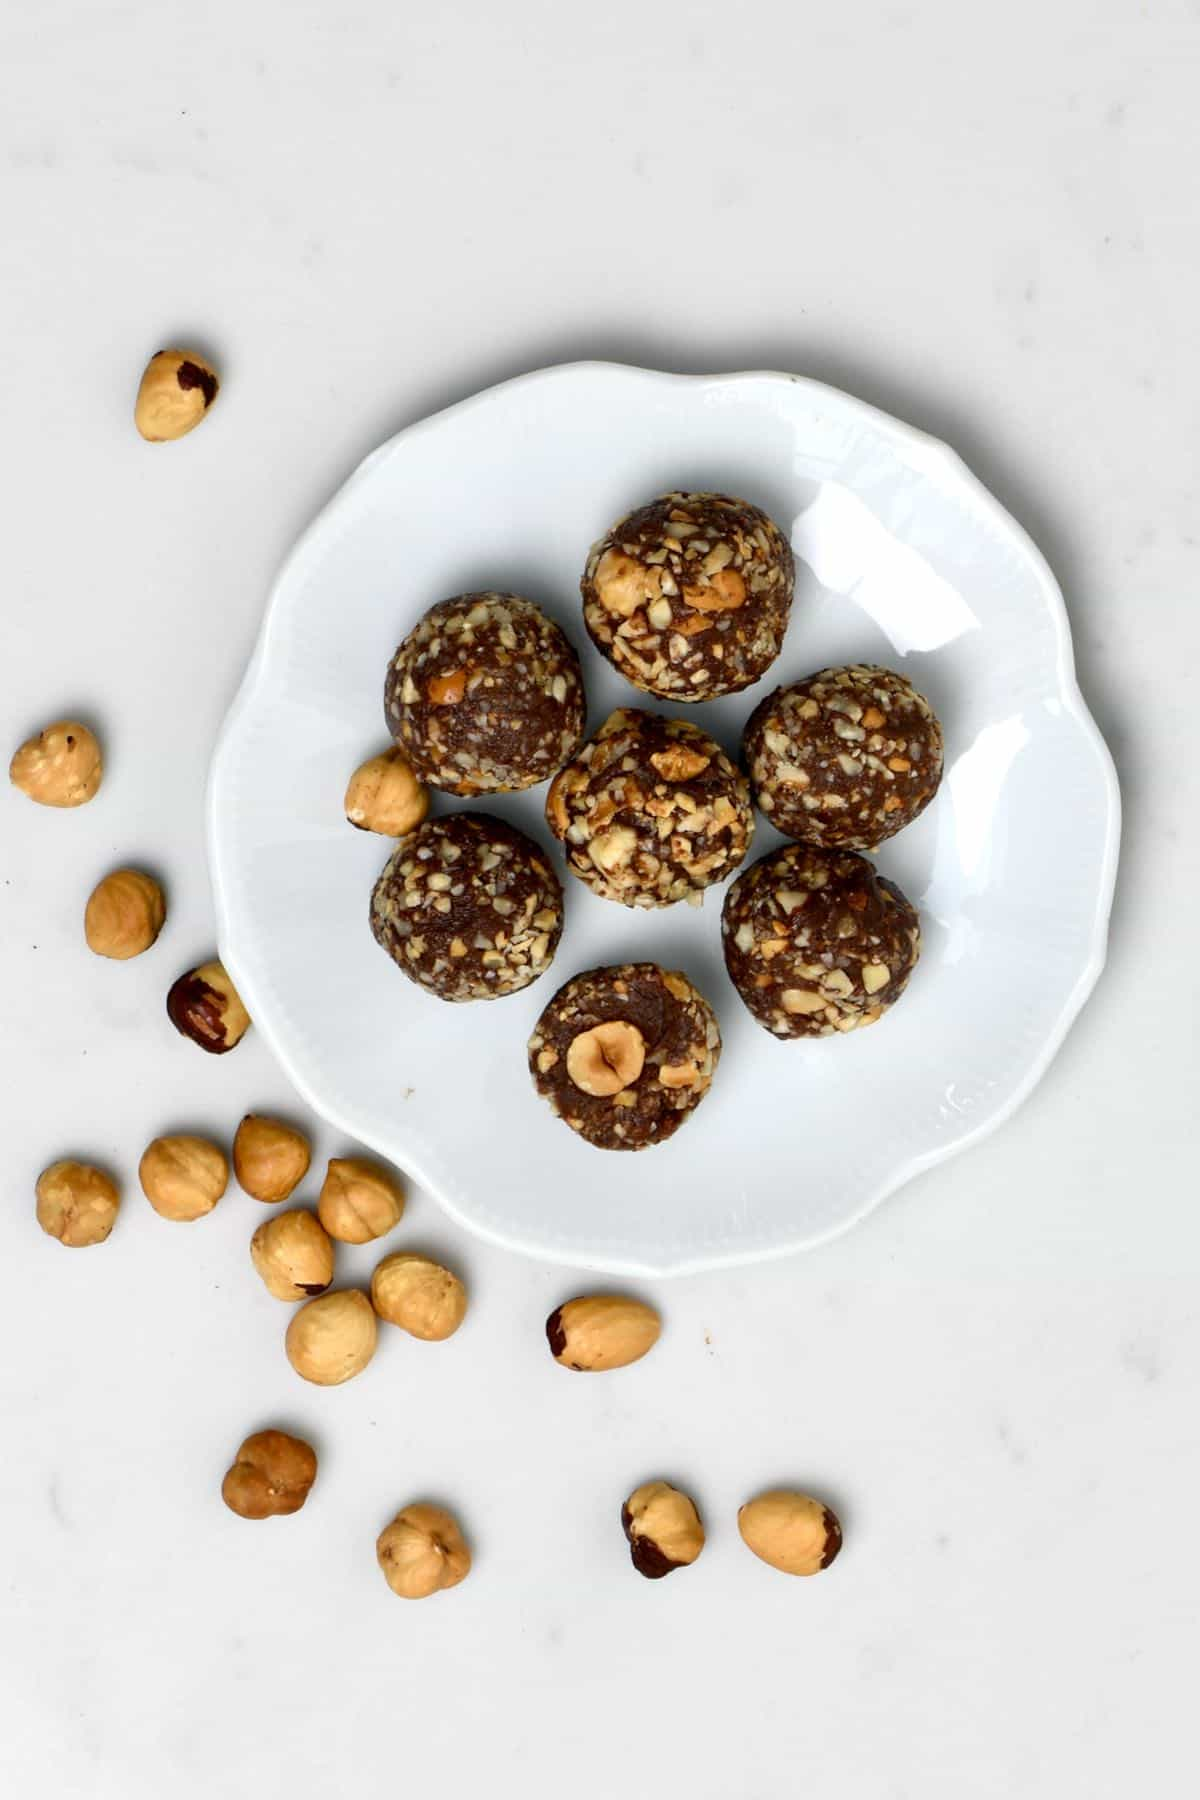 Seven vegan Ferrero Rocher on a plate